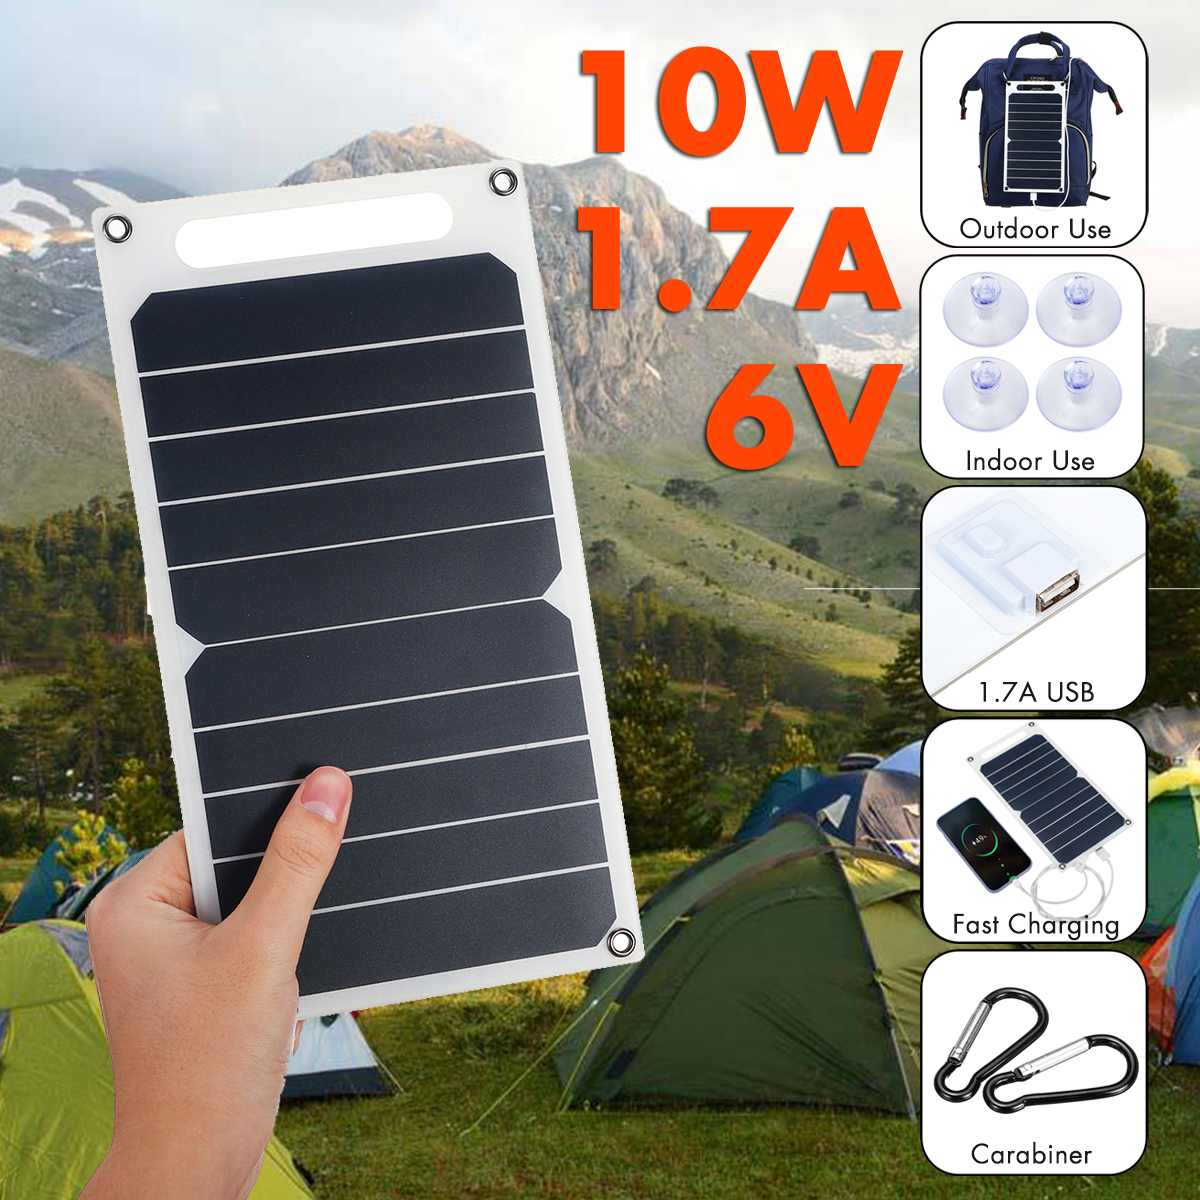 10W 6V Panel Solar portátil células solares SunPower USB teléfono móvil cargador fotovoltaico banco de energía con ventosas y mosquetón